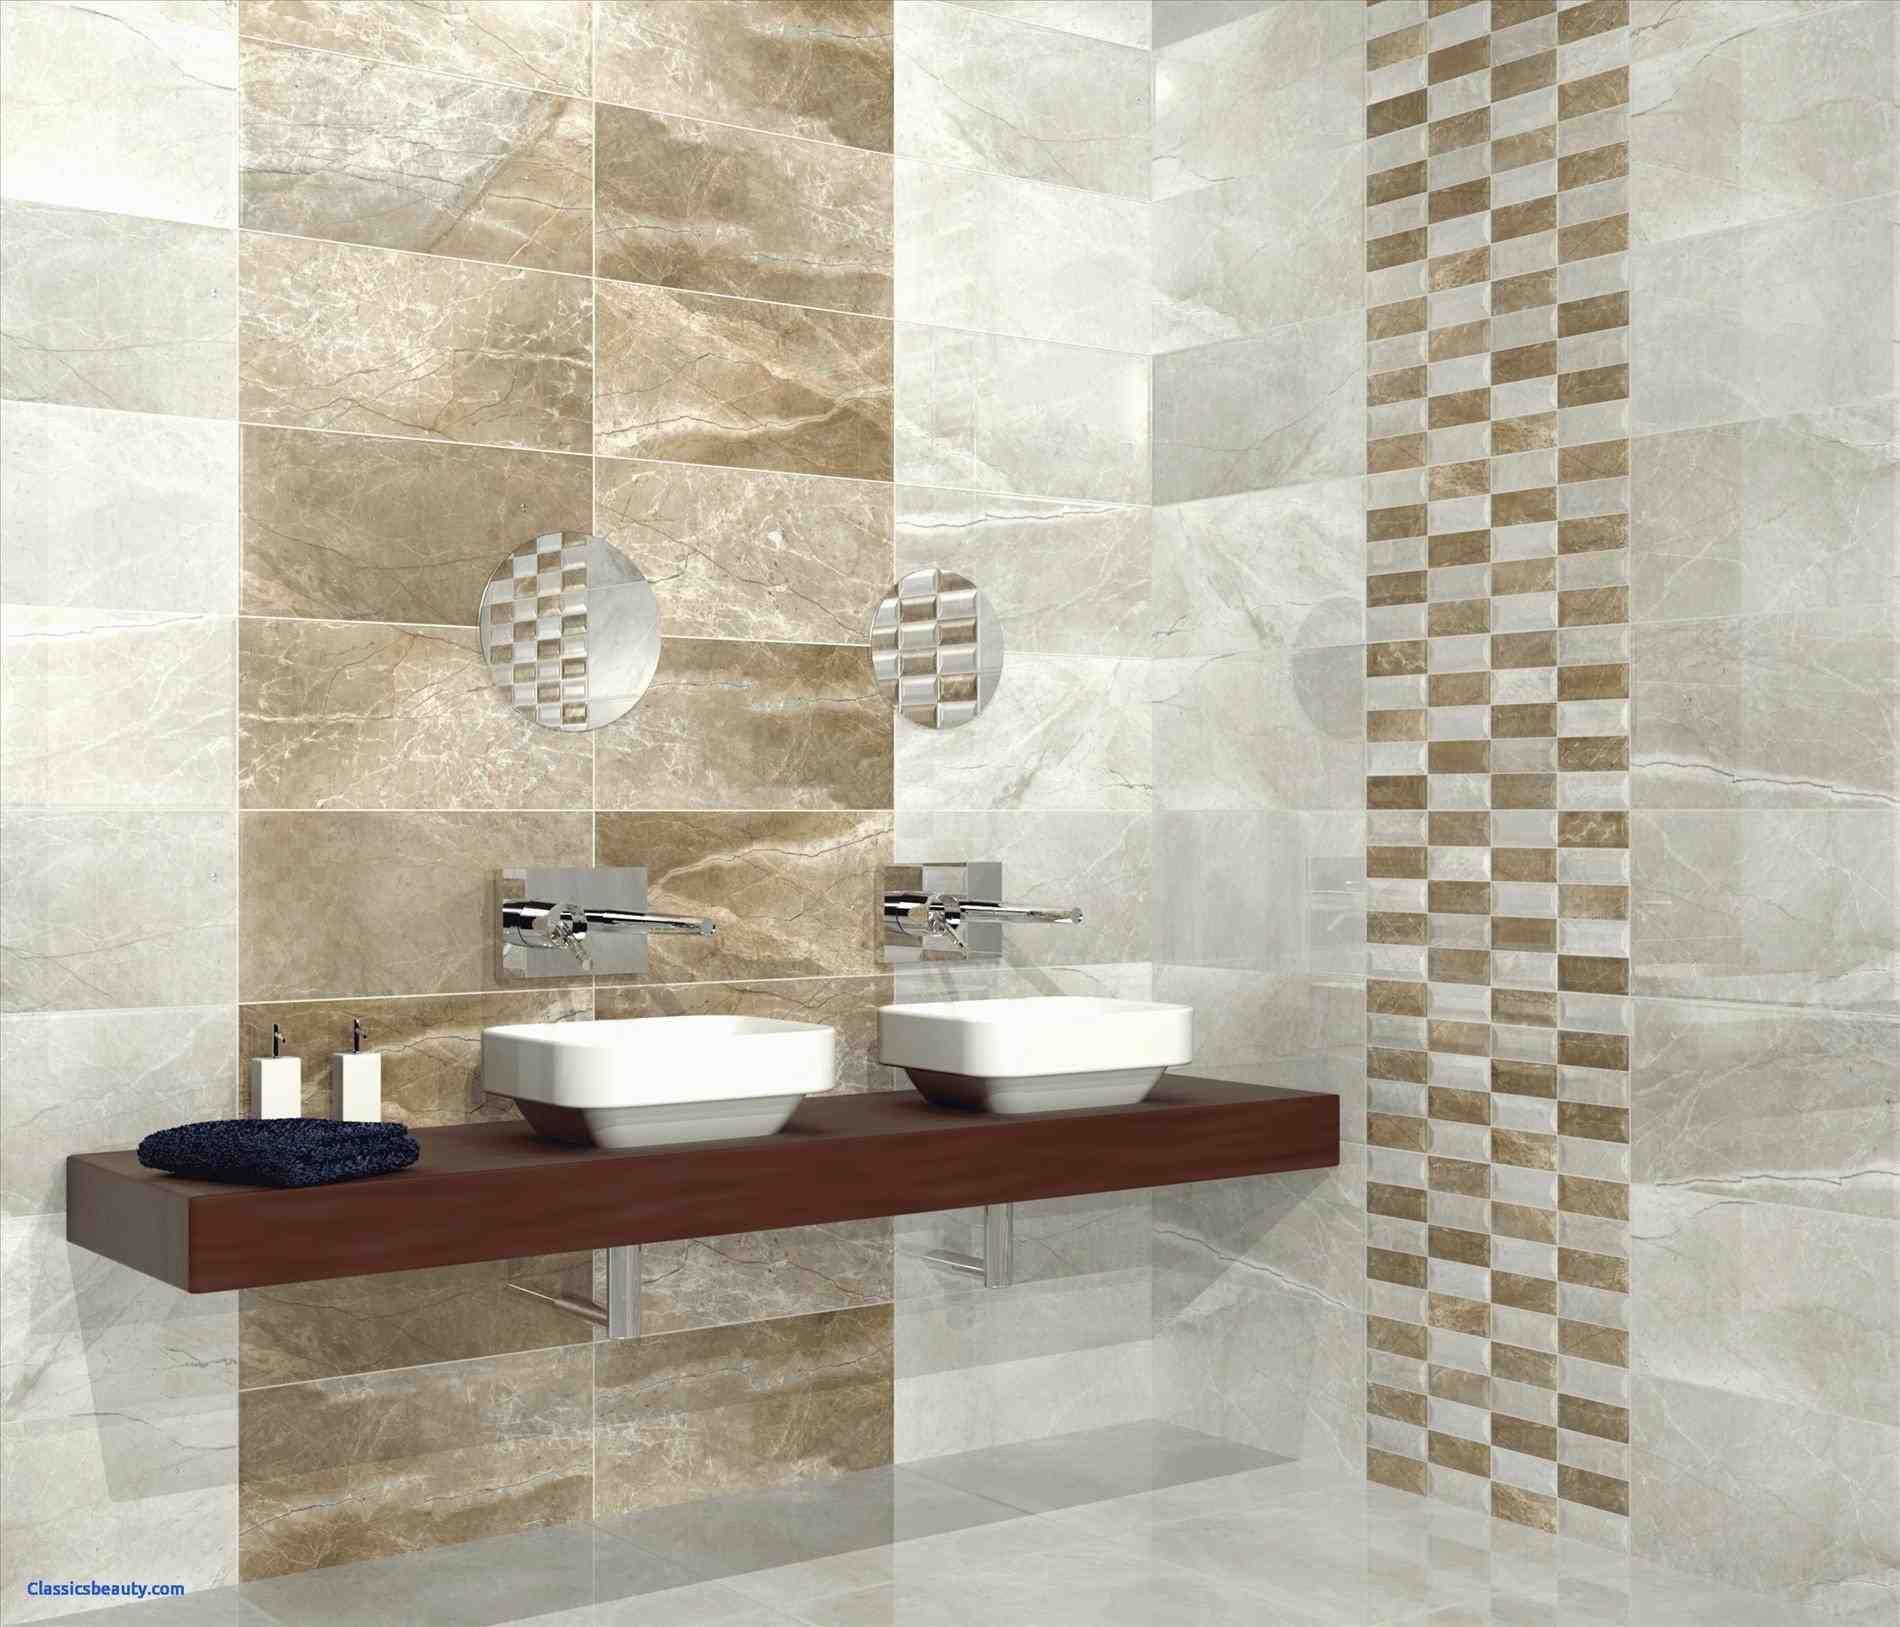 New Post Indian Bathroom Tiles Design Visit Bobayule Trending